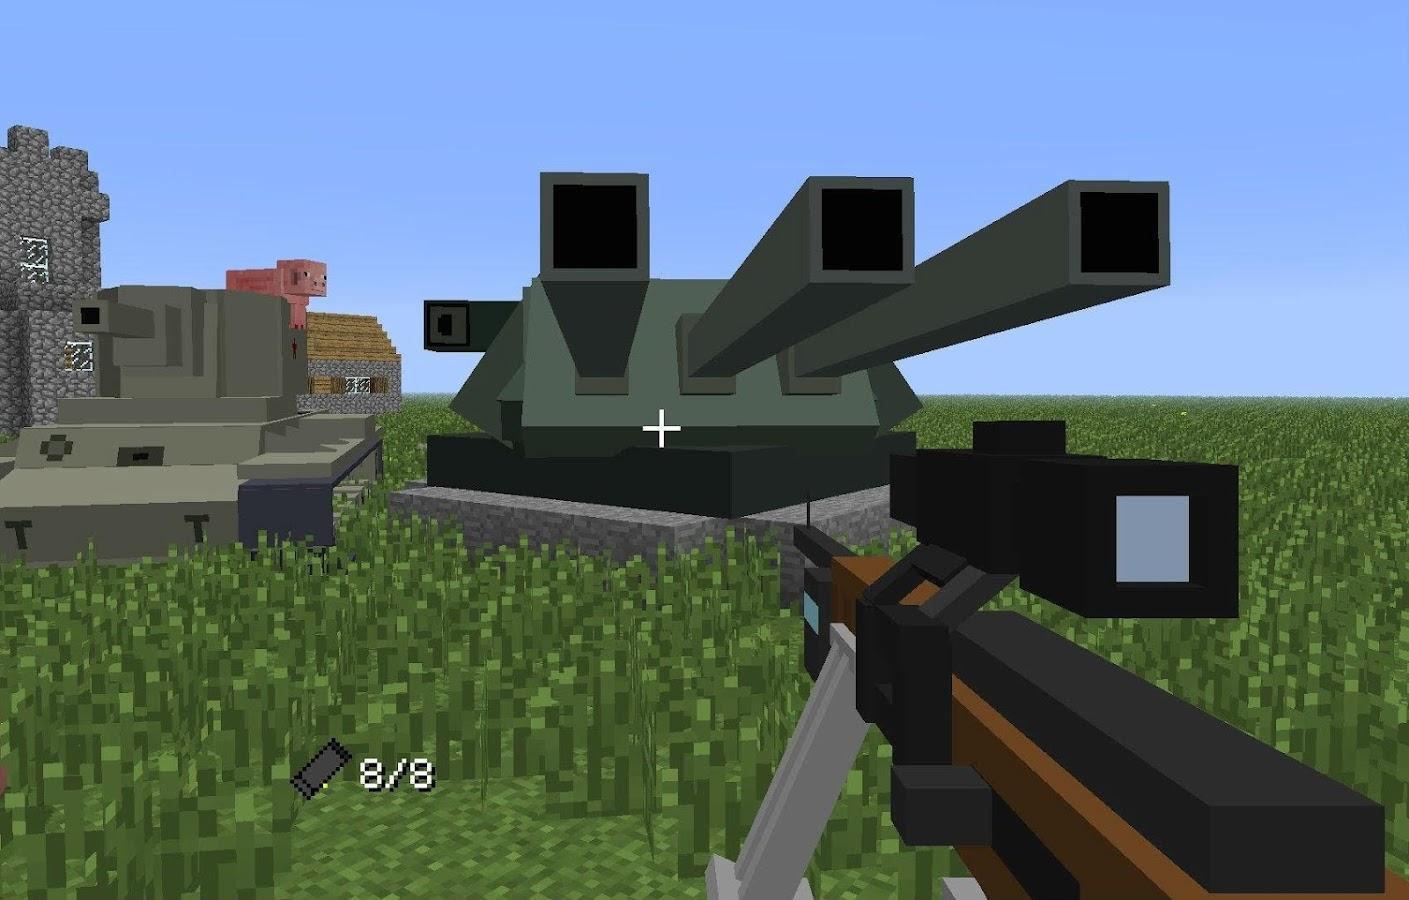 Flans Mod Minecraft Ideas APK Download Android - Minecraft maps fur flans mod